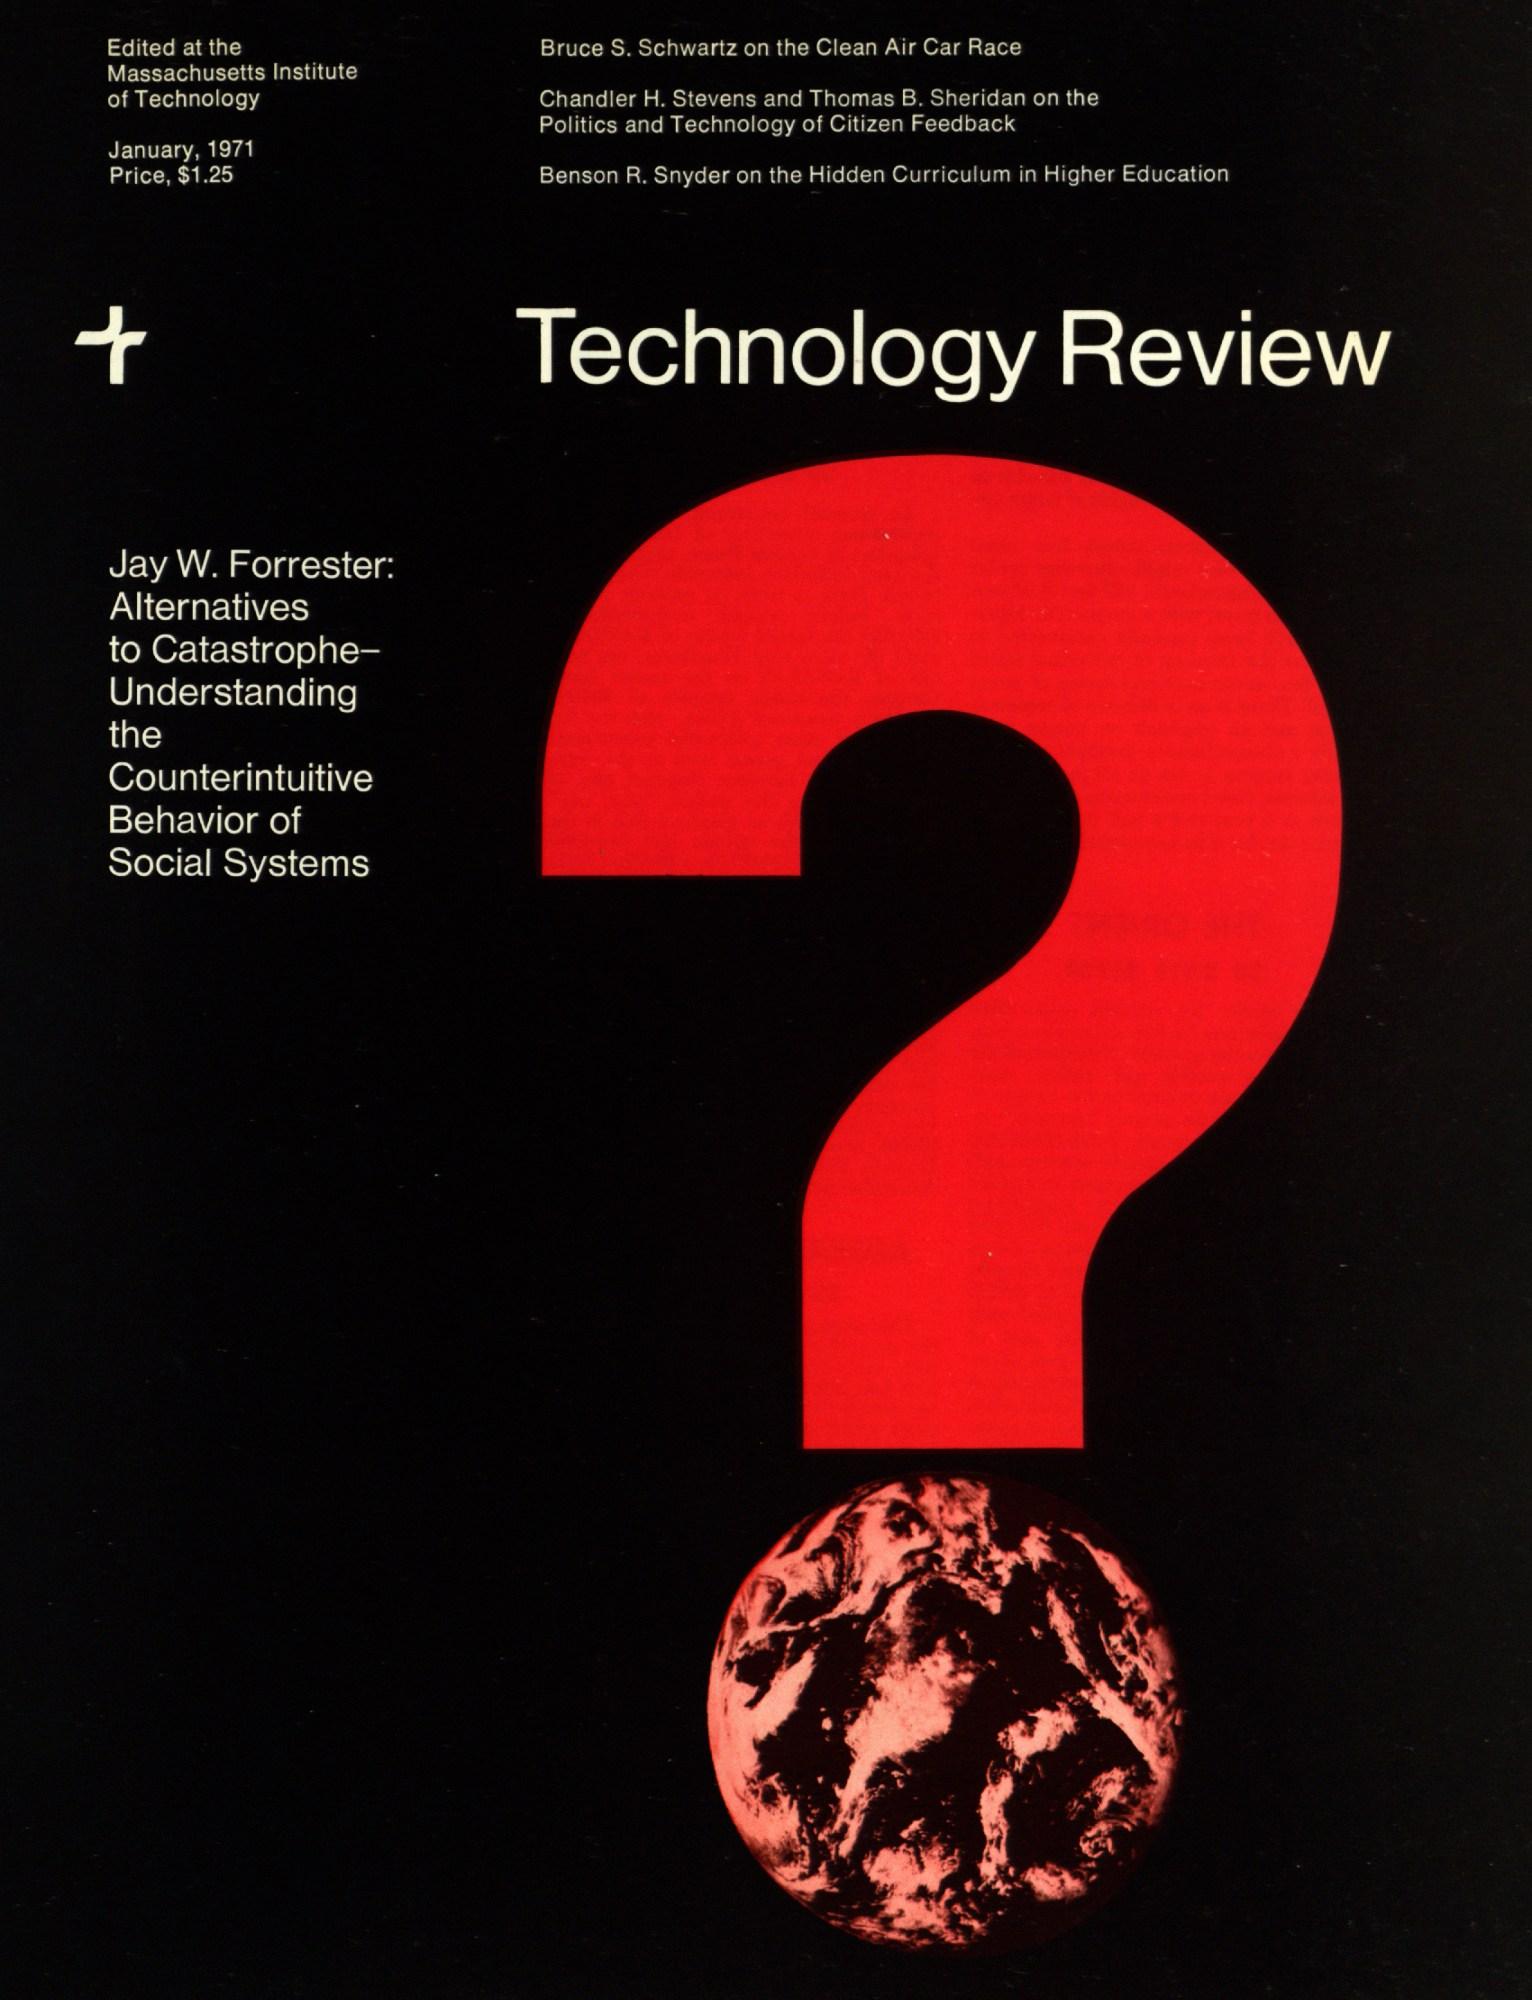 Jan 1971 cover